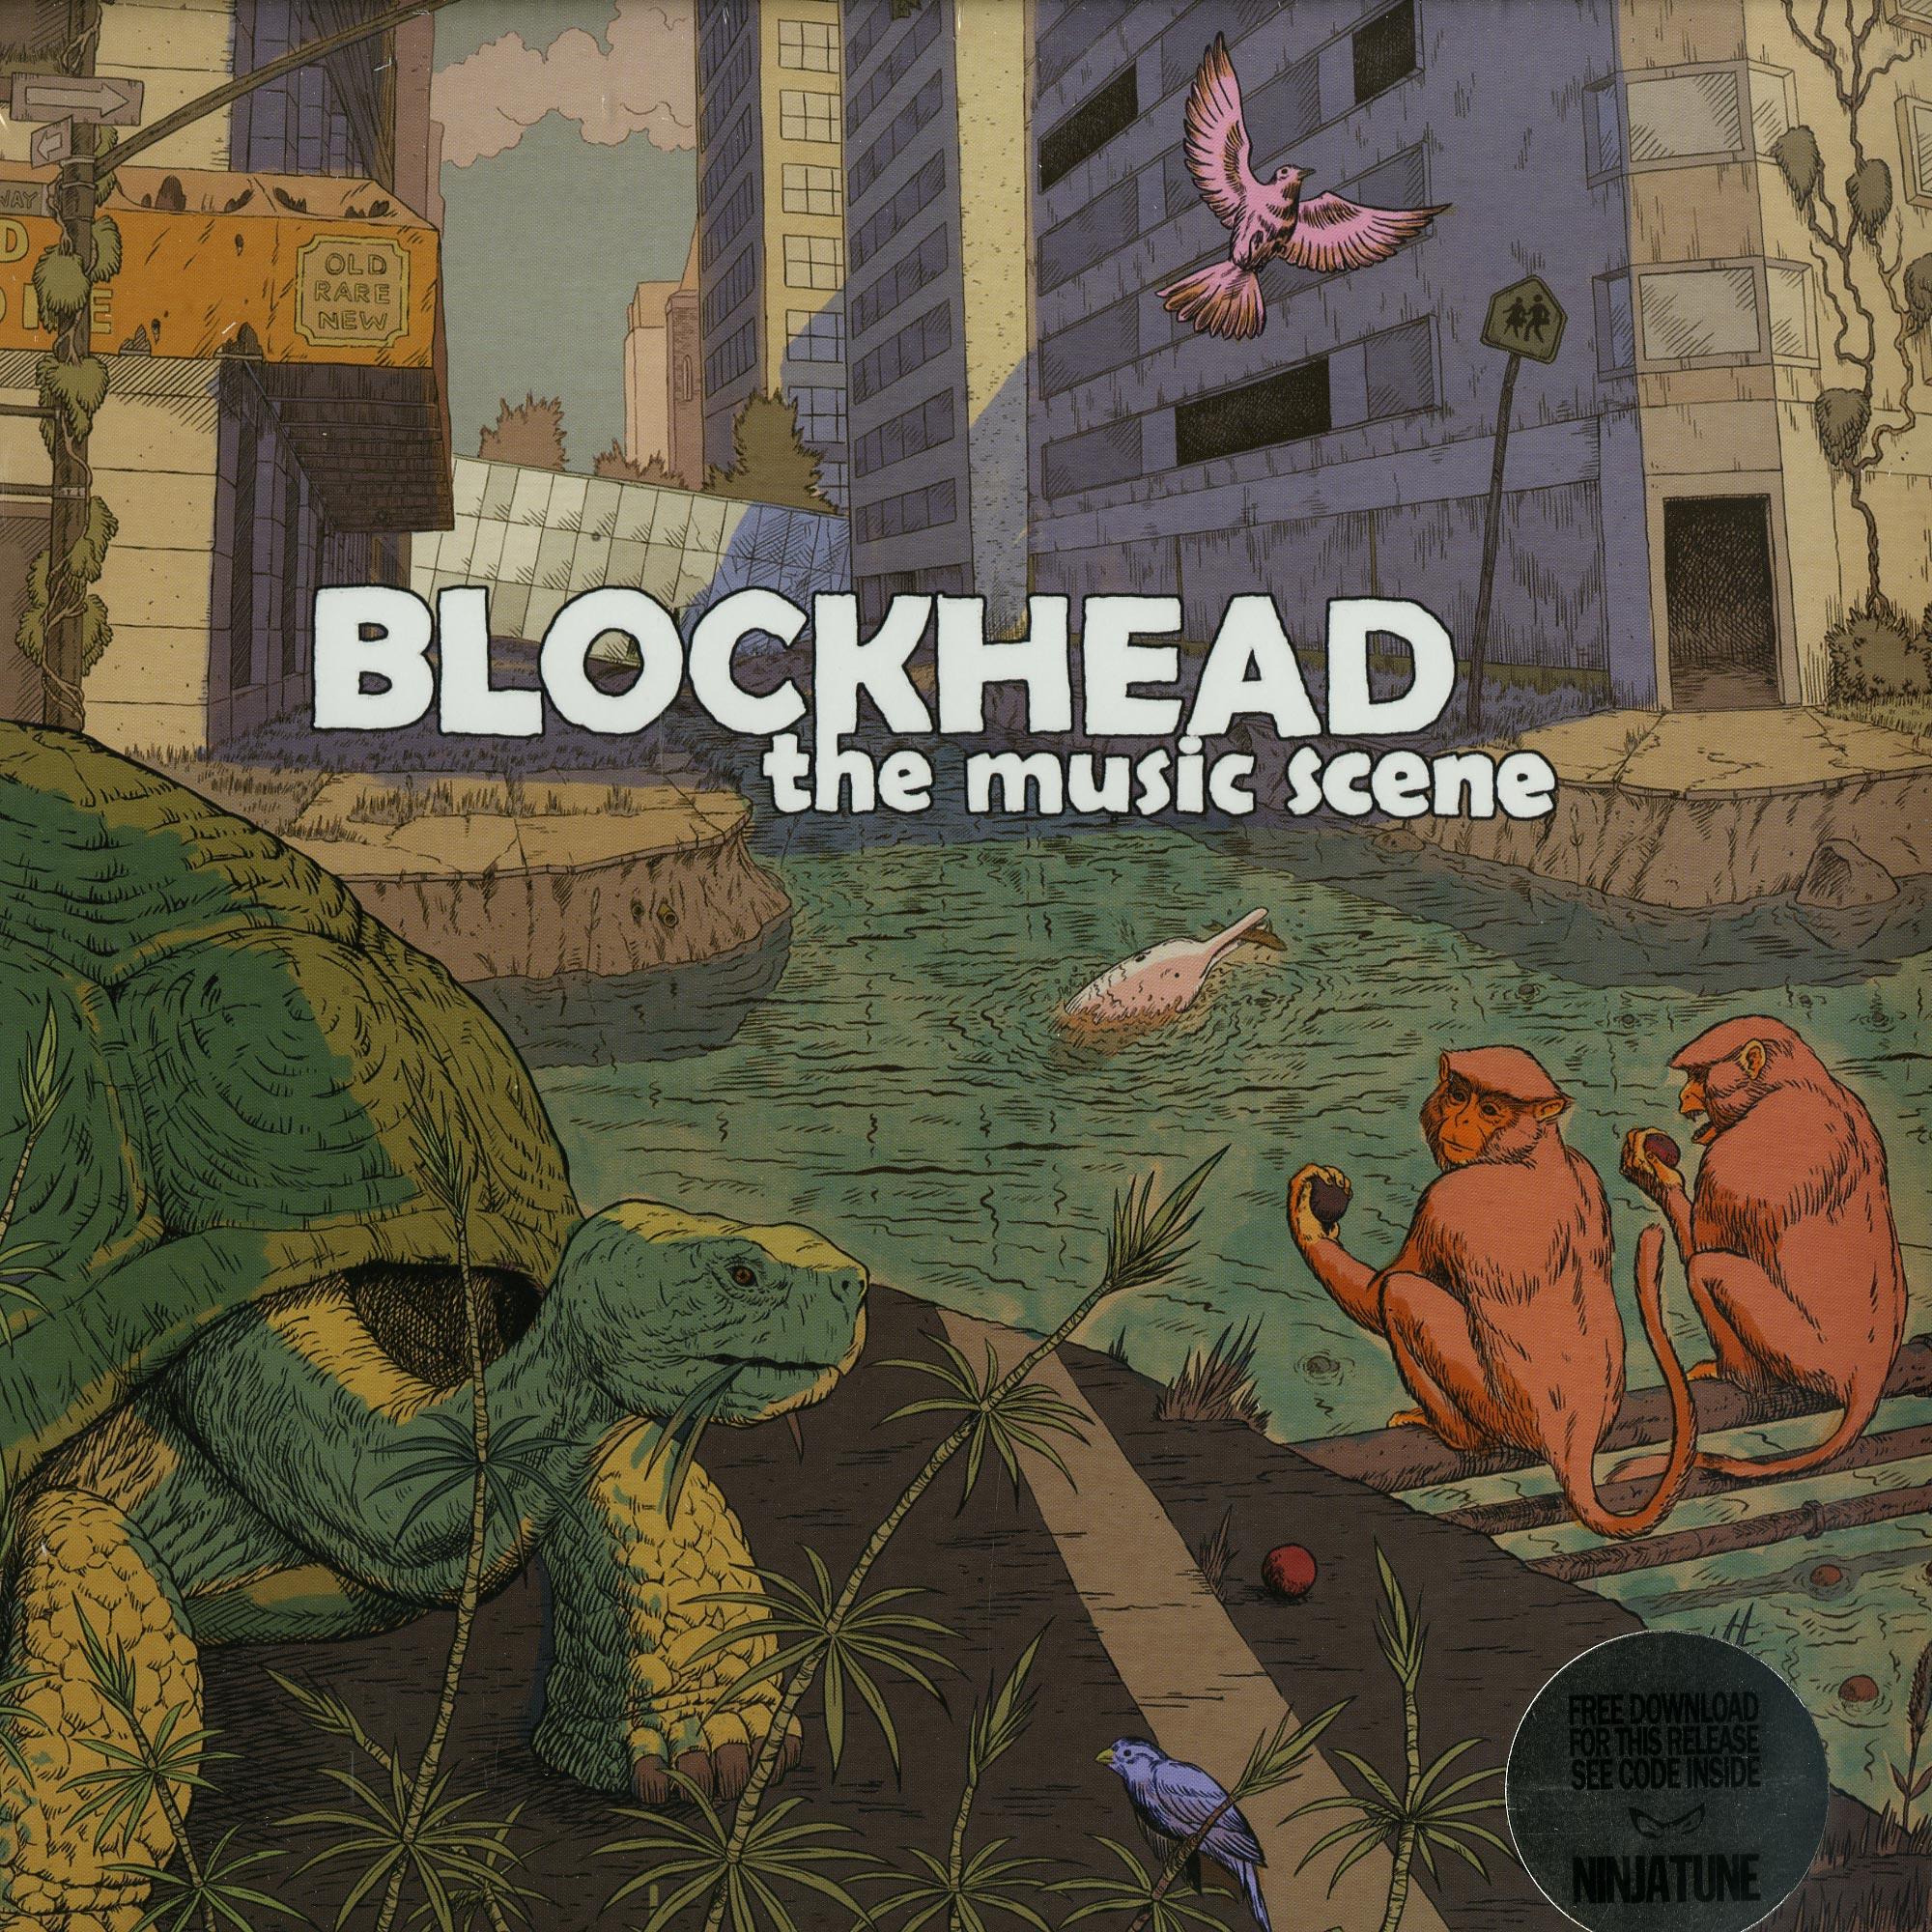 The Blockhead - THE MUSIC SCENE